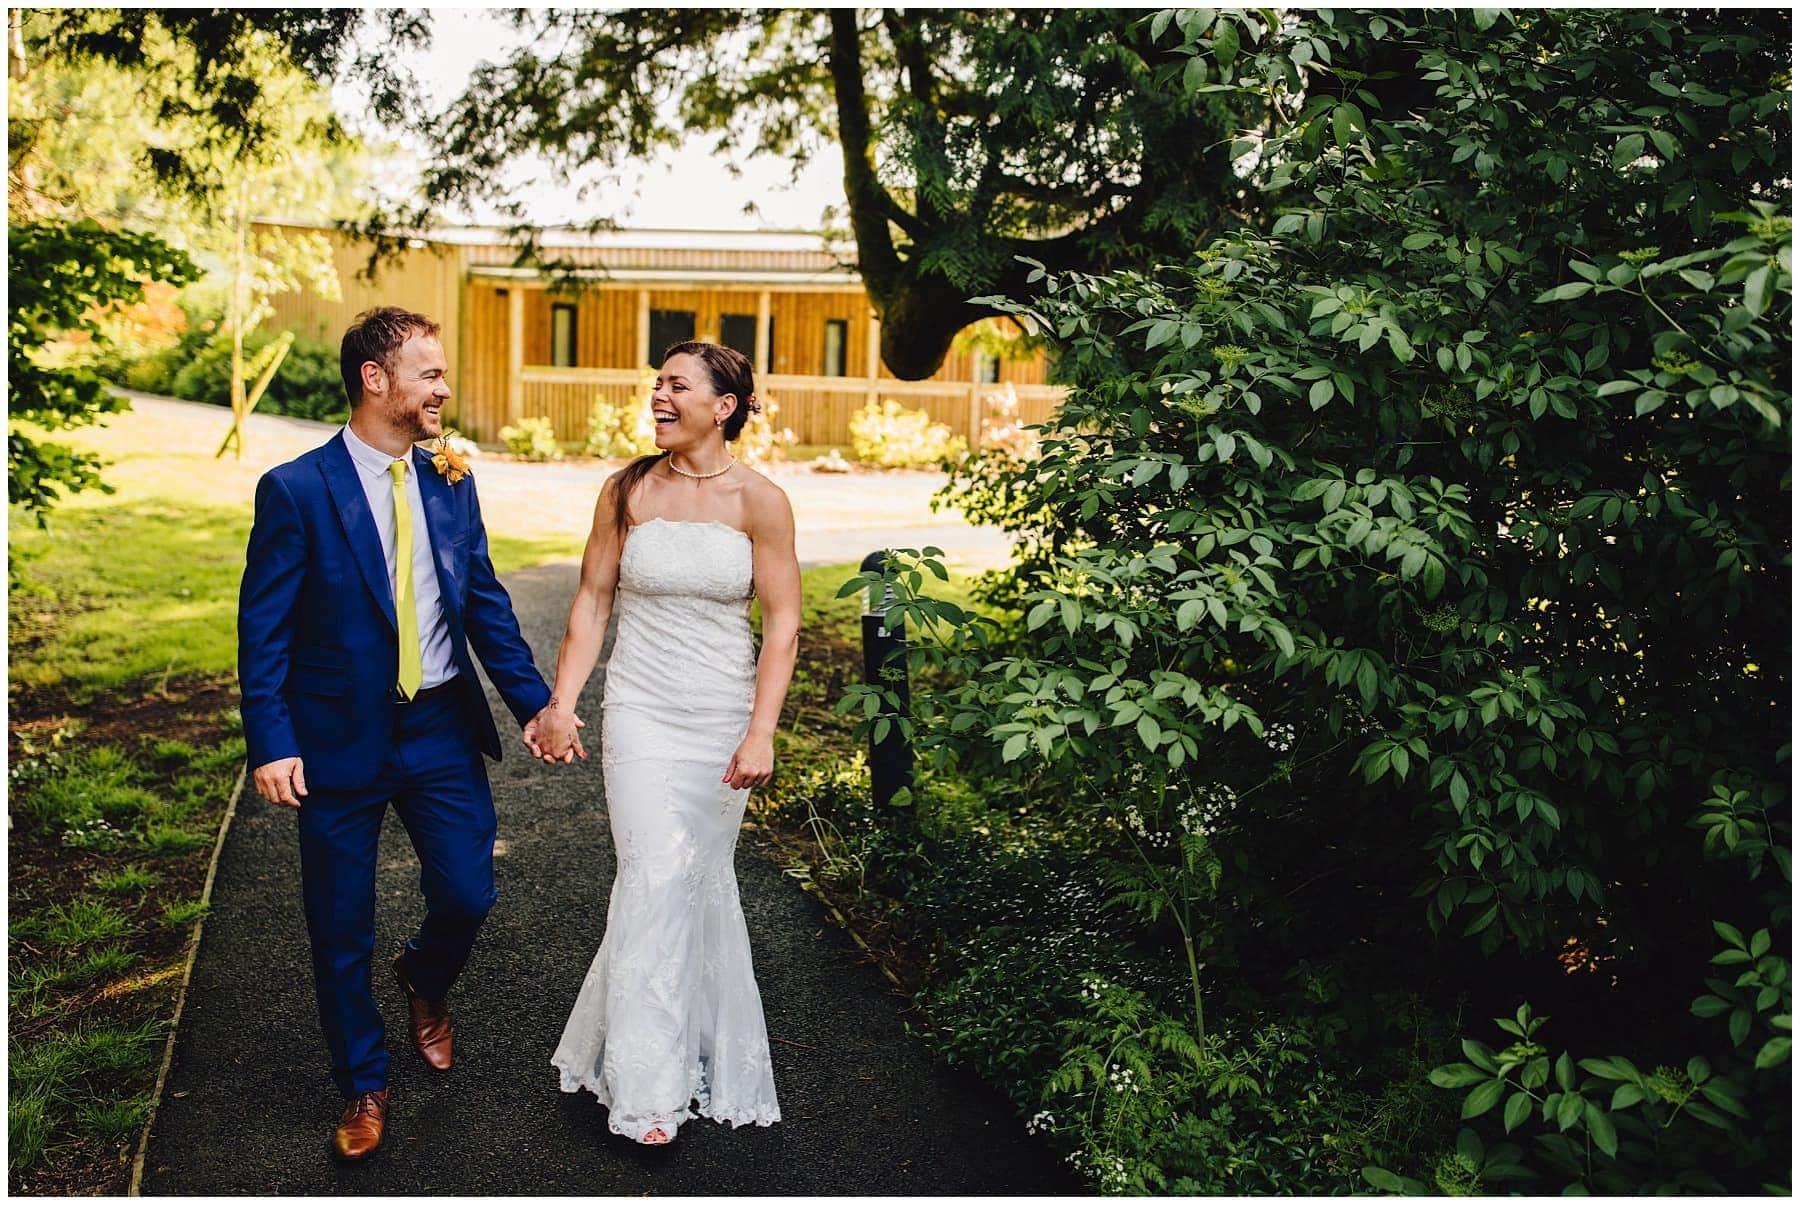 Hothorp Hall Woodlands Wedding Photographer 33